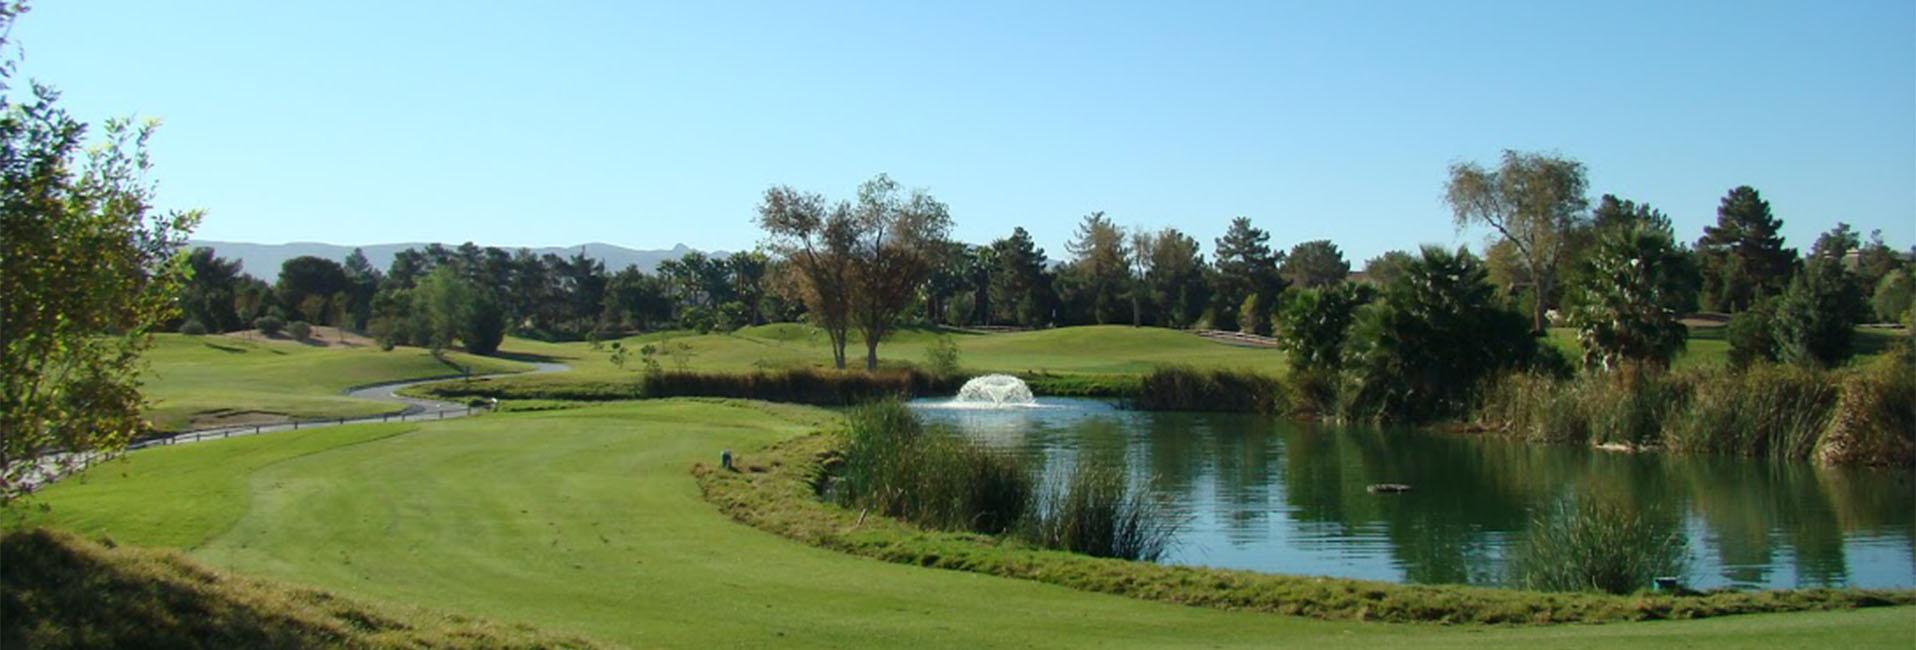 Wildhorse Golf Golf Course Henderson Las Vegas Golf